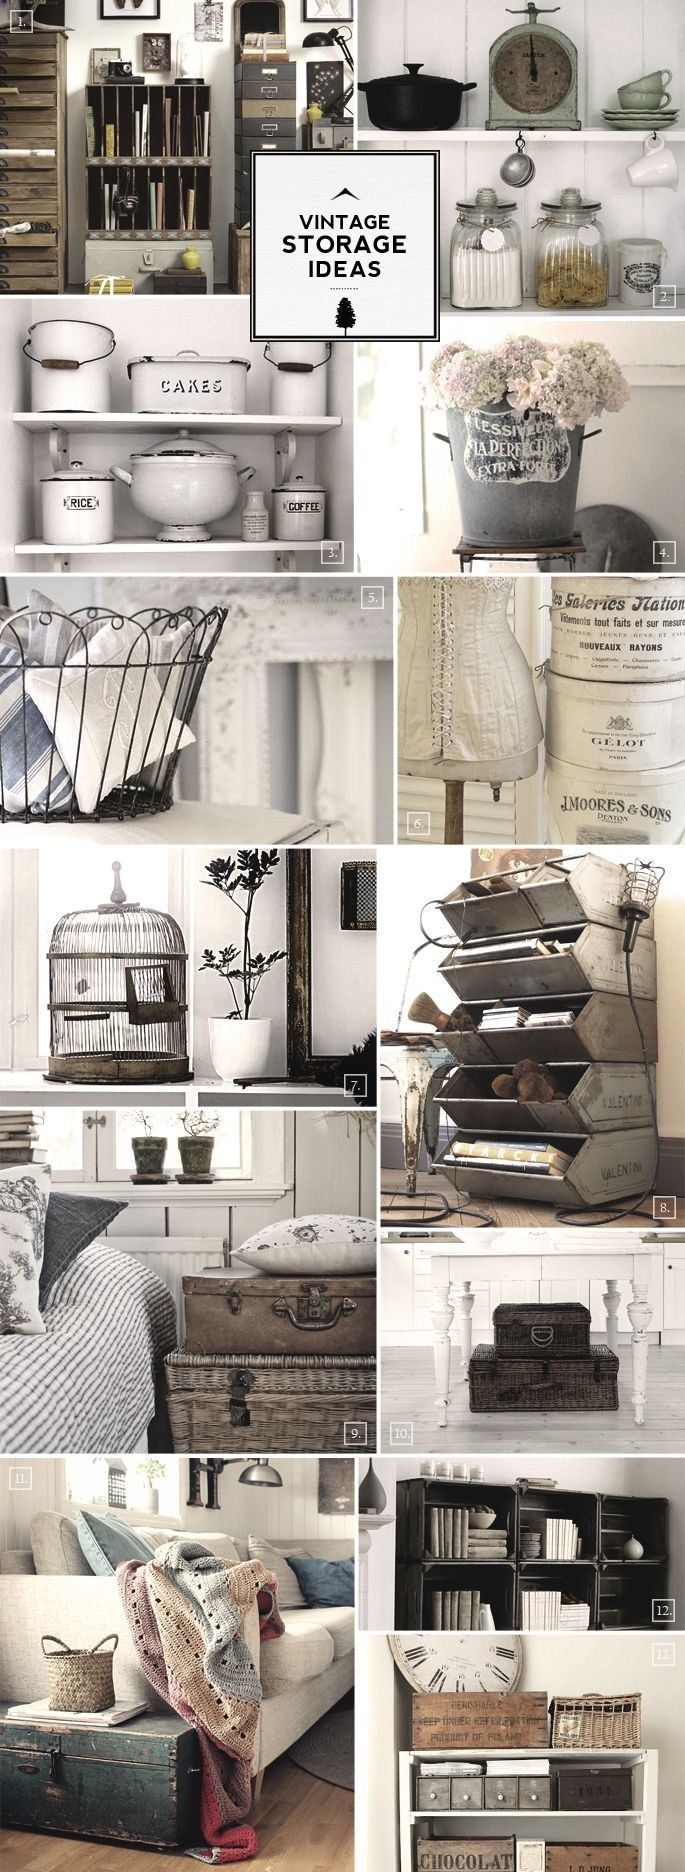 Vintage Storage Ideas - myshabbychicdecor... - myshabbychicdecor...